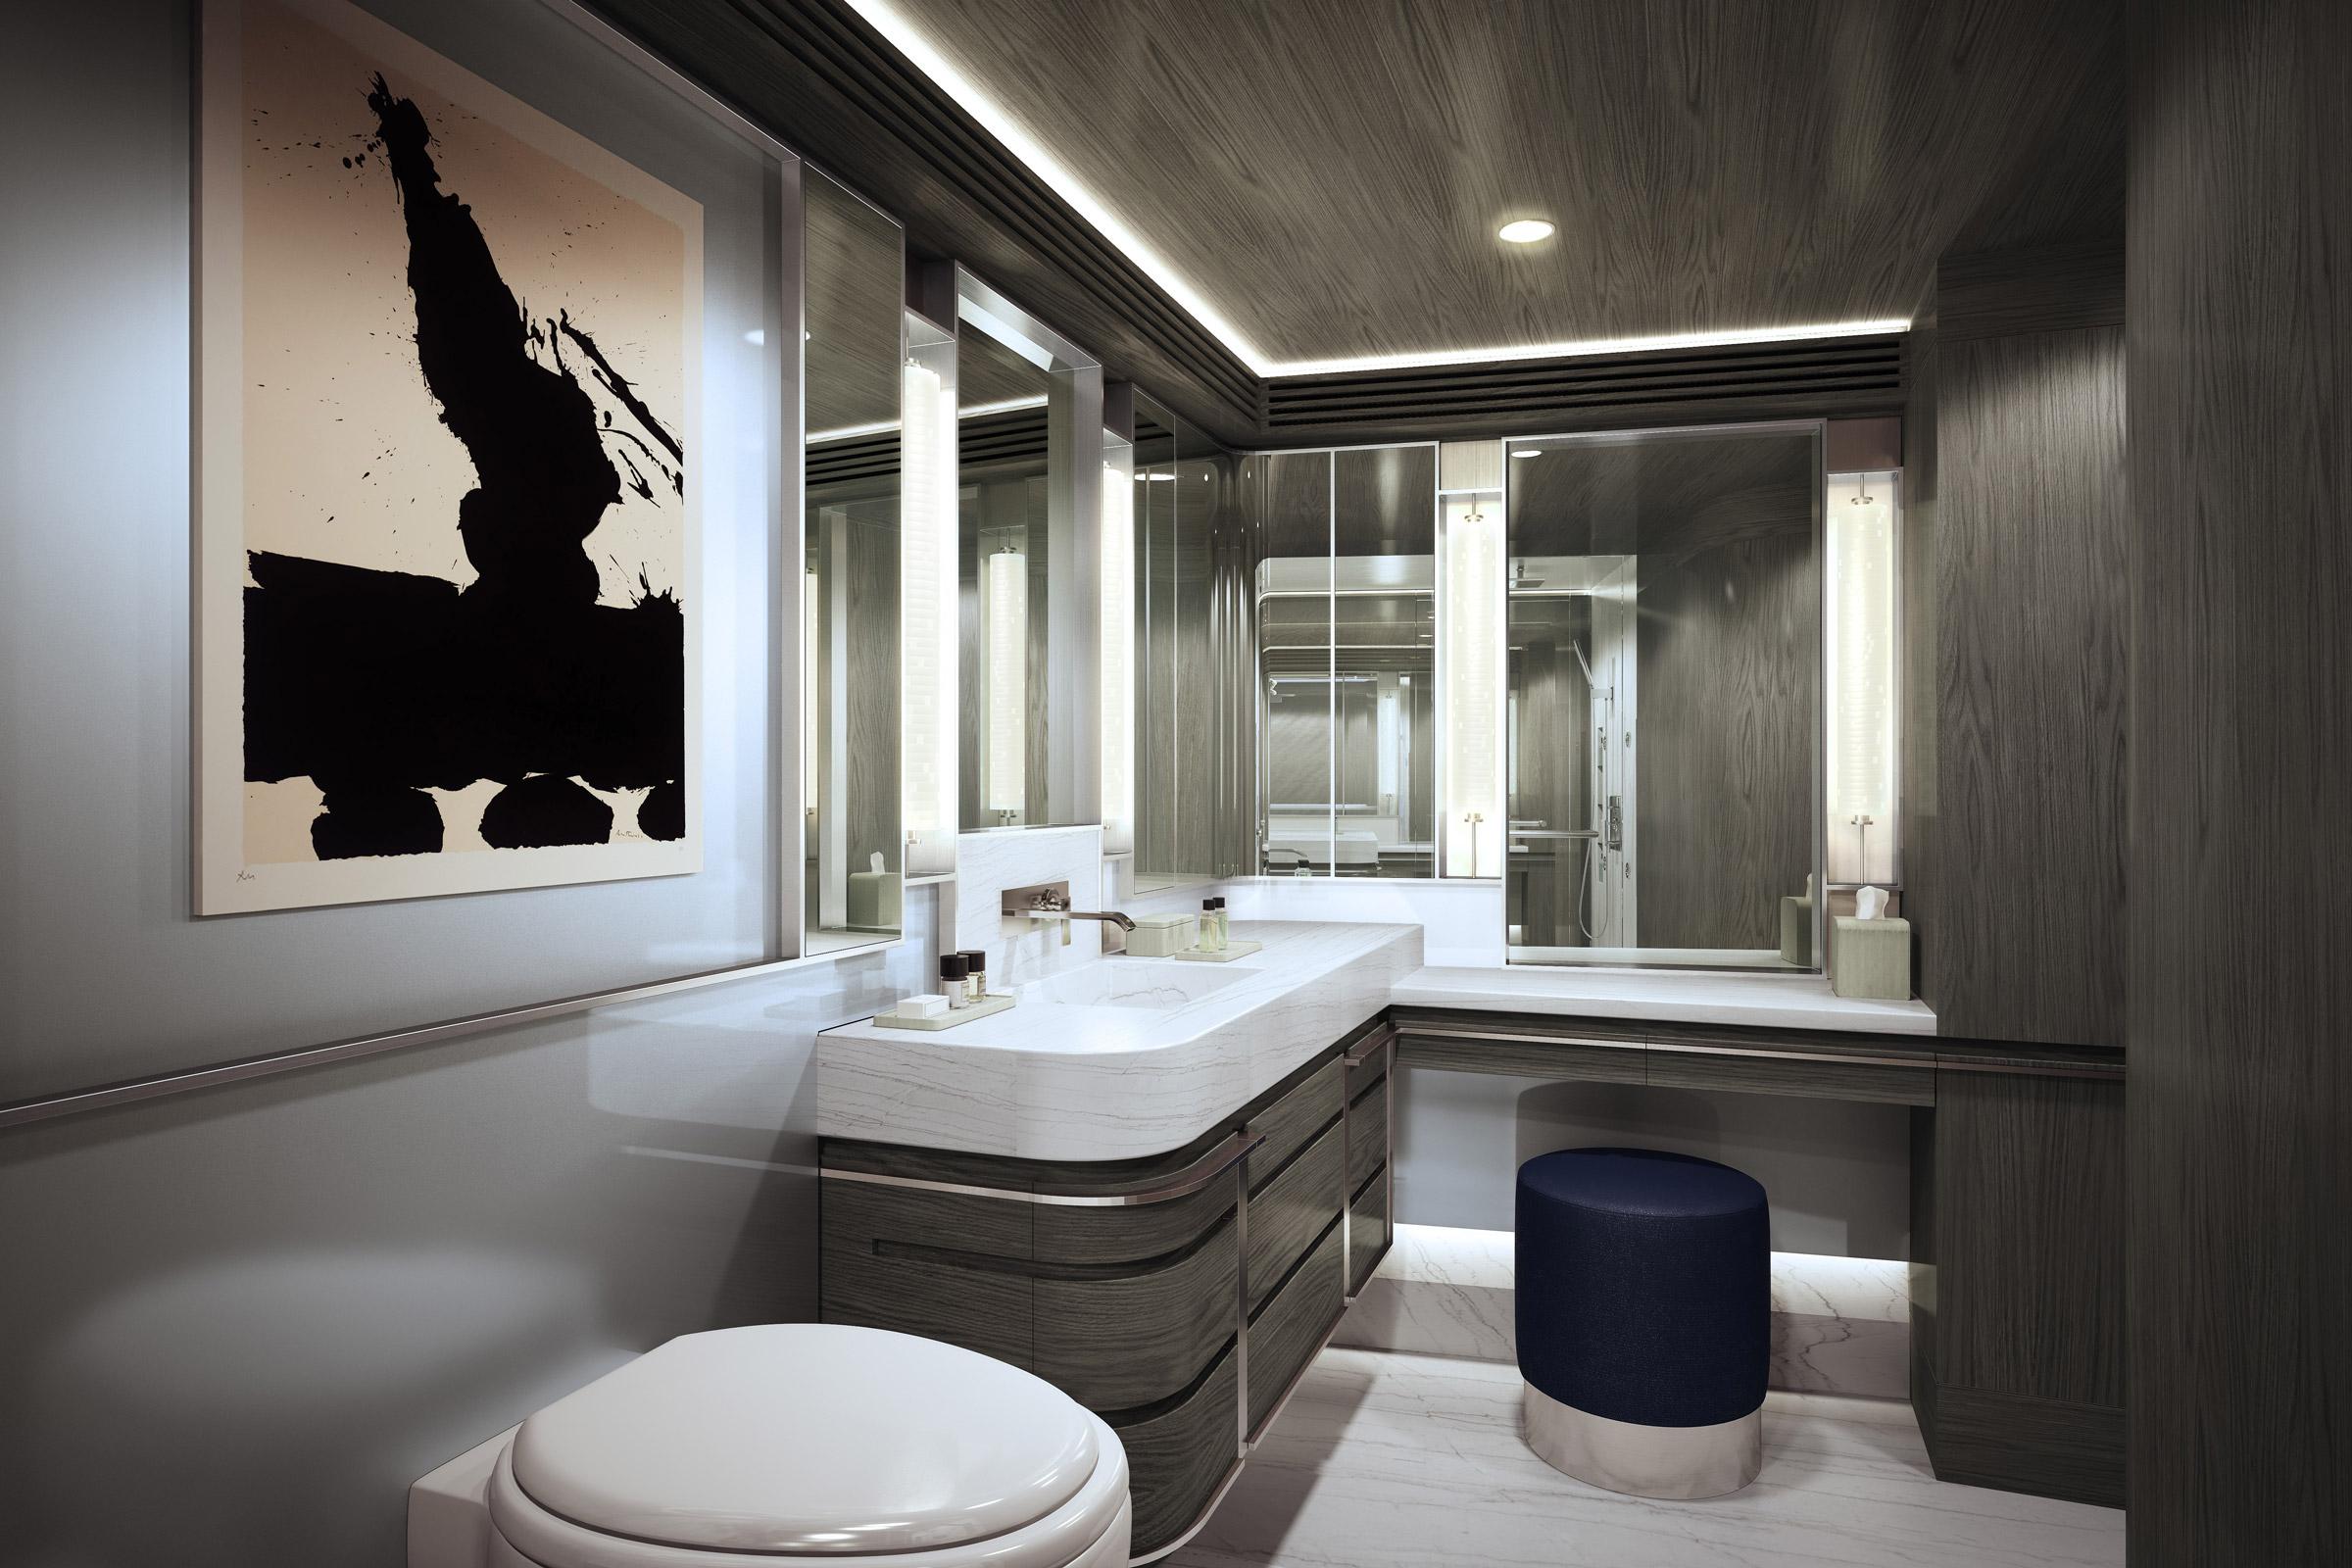 HH_Yacht_Master_Bathroom_Cam1_V2_005